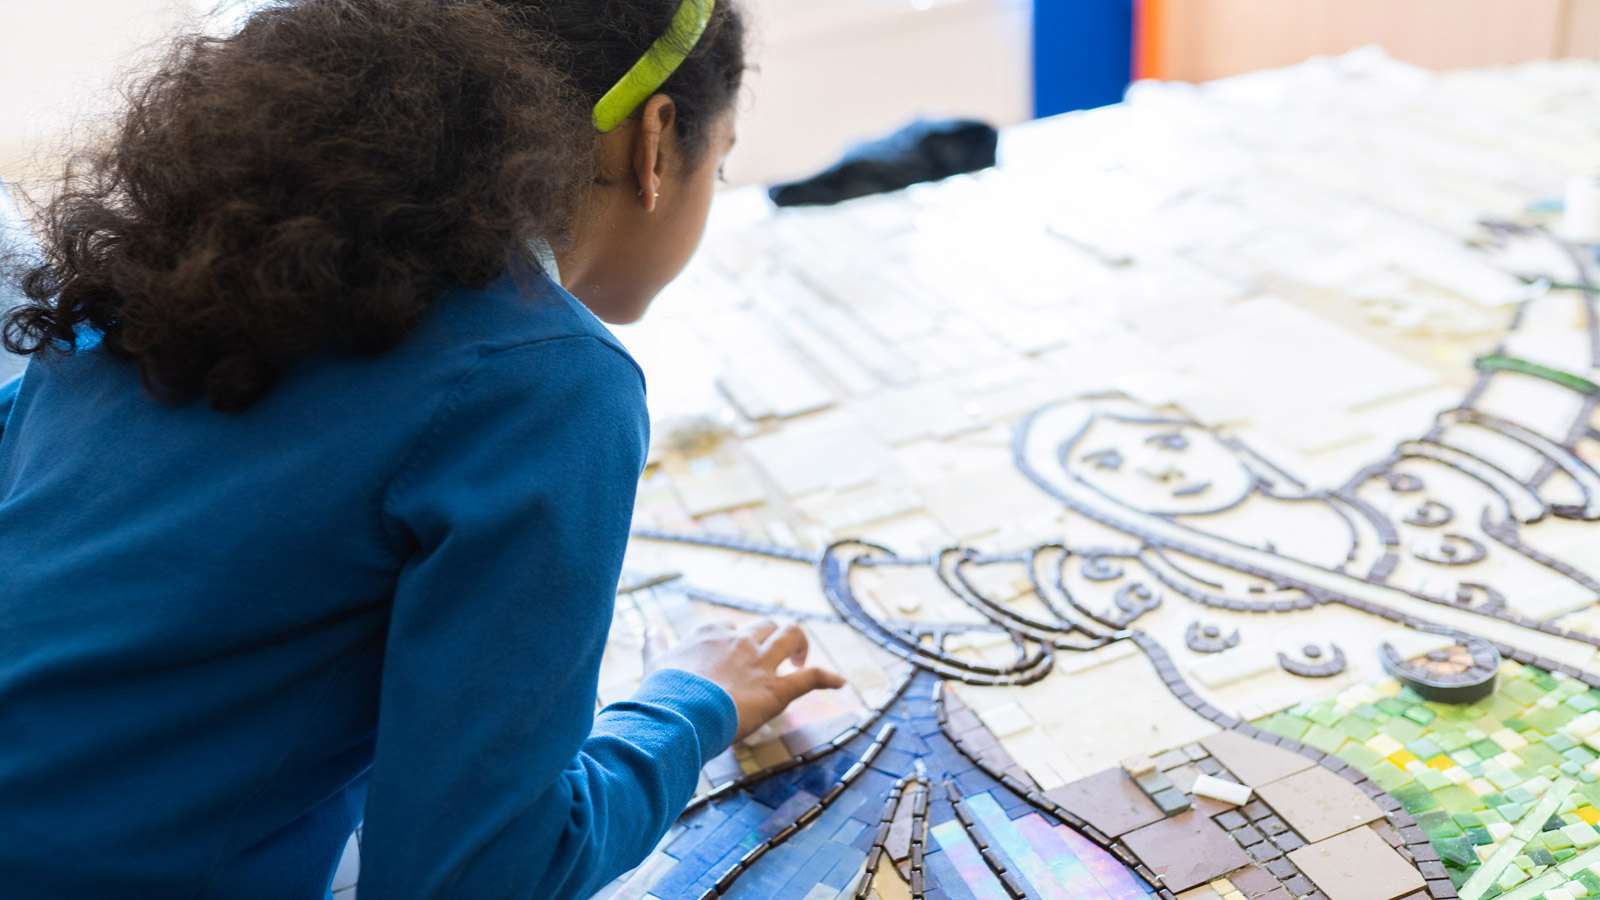 Child making mosaic